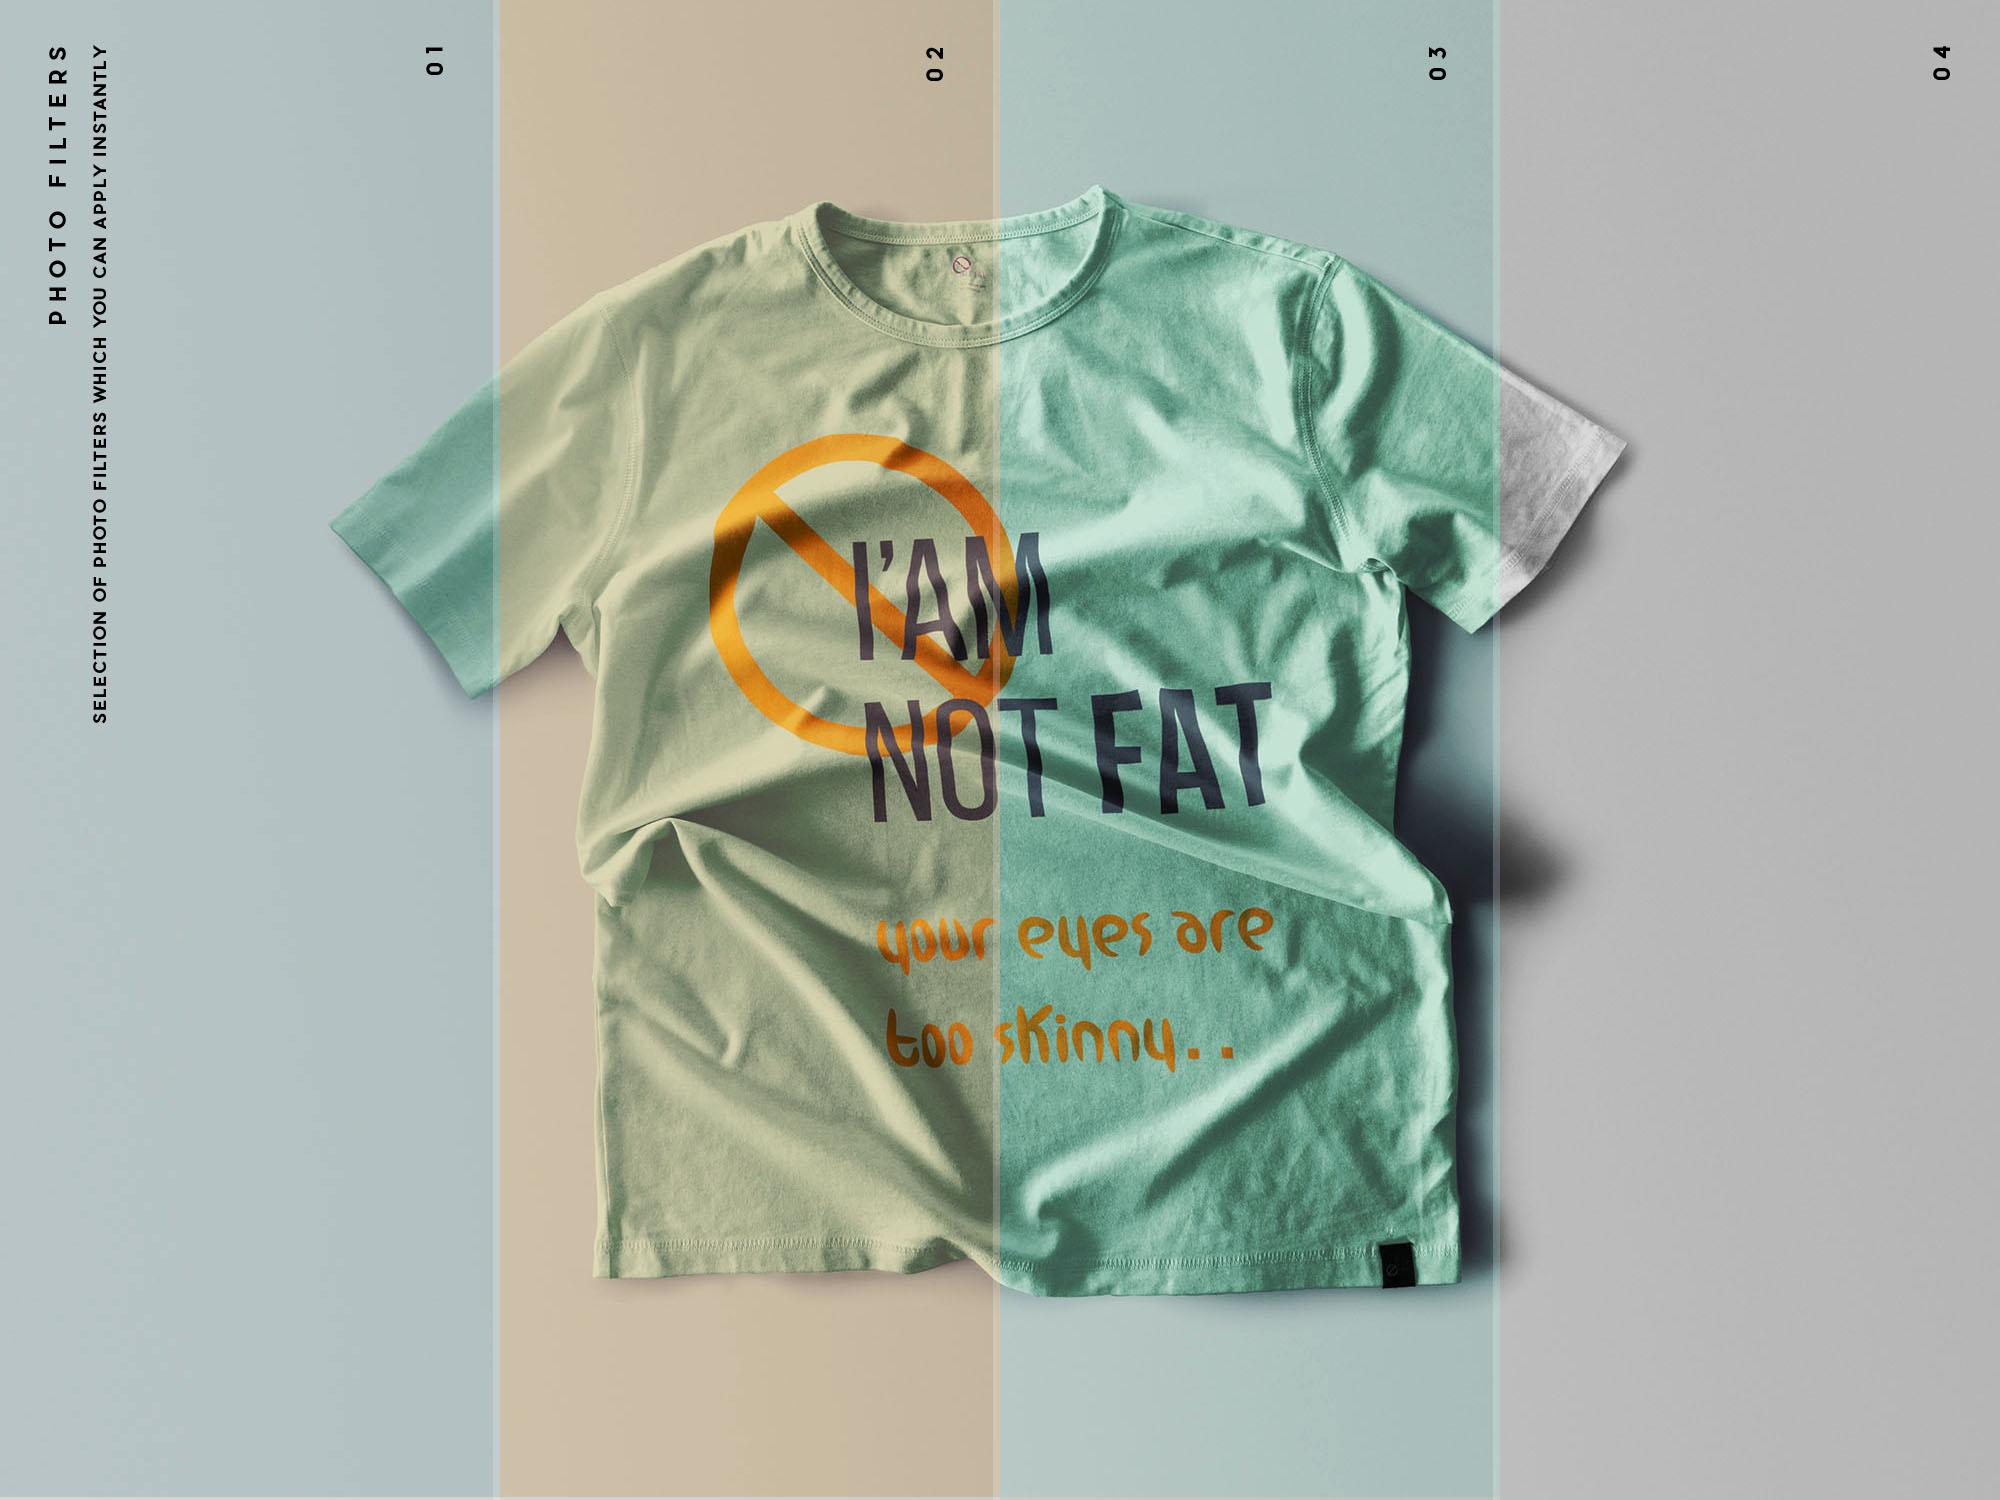 T-Shirt Mockups Filters